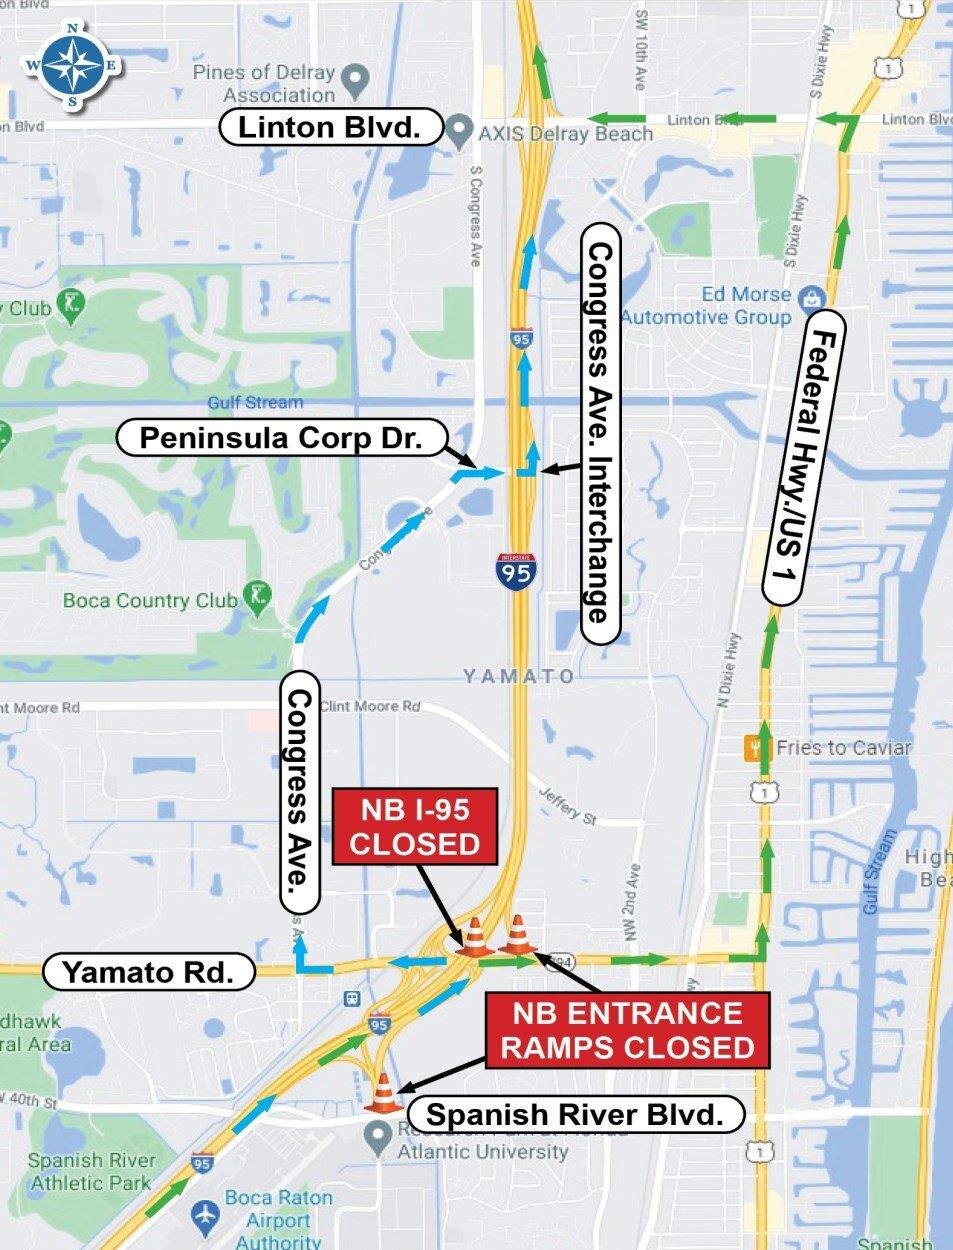 FDOT map of I-95 Yamato Road closures June 2021